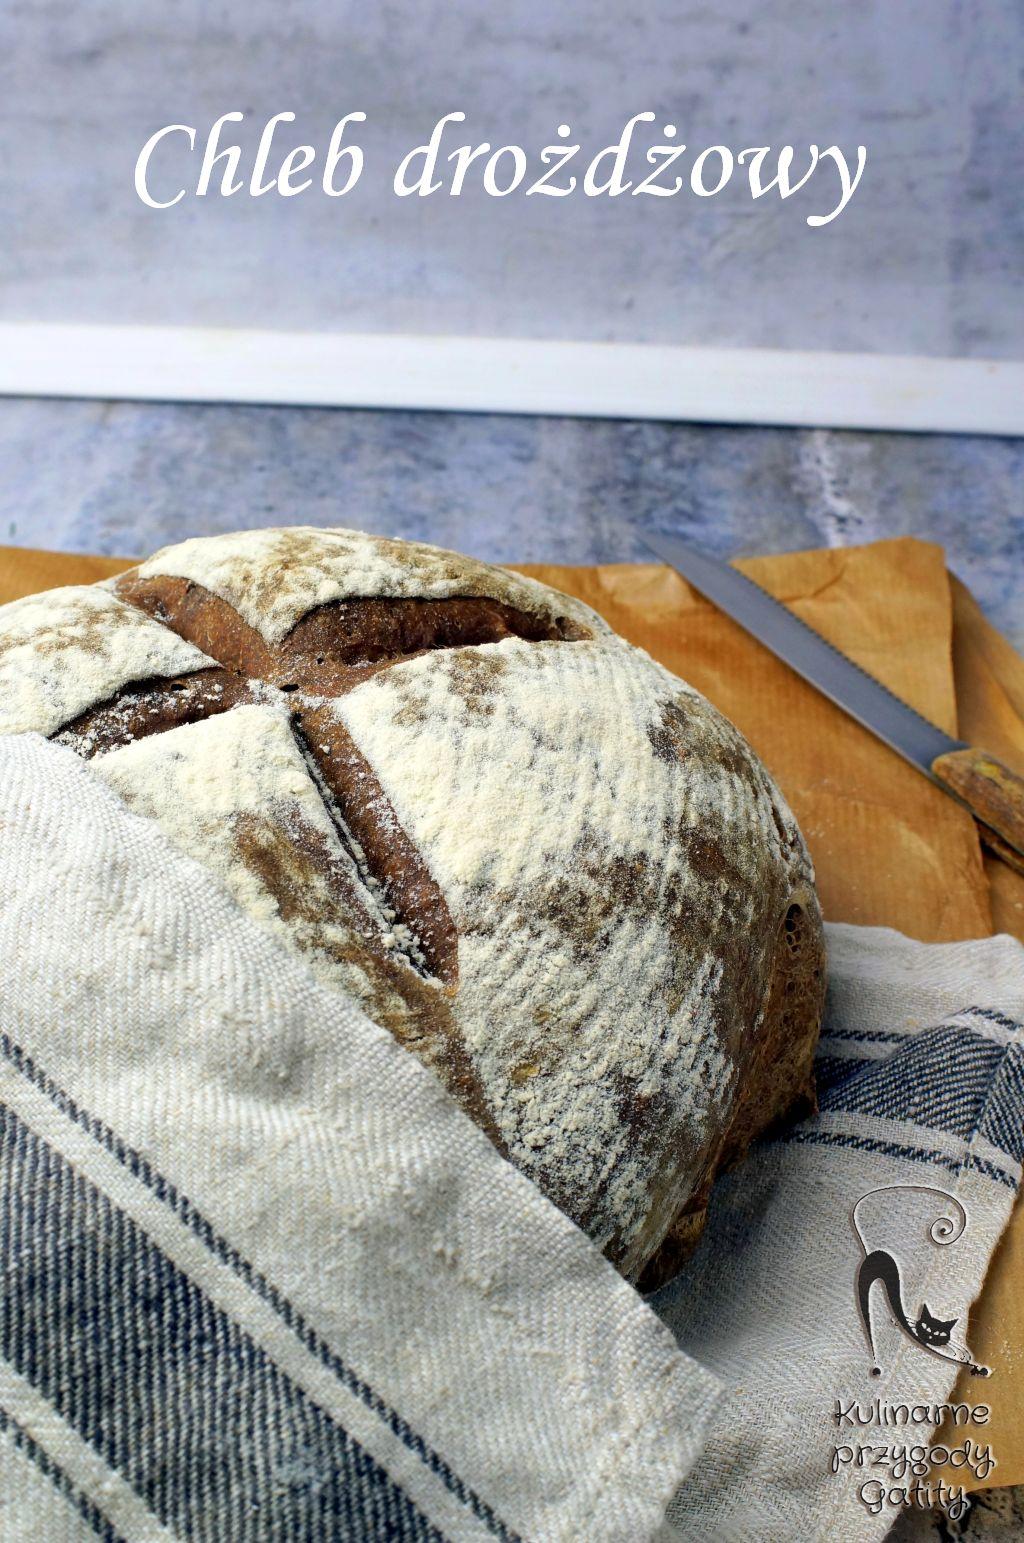 bochenek-chleba-widok-z-gory